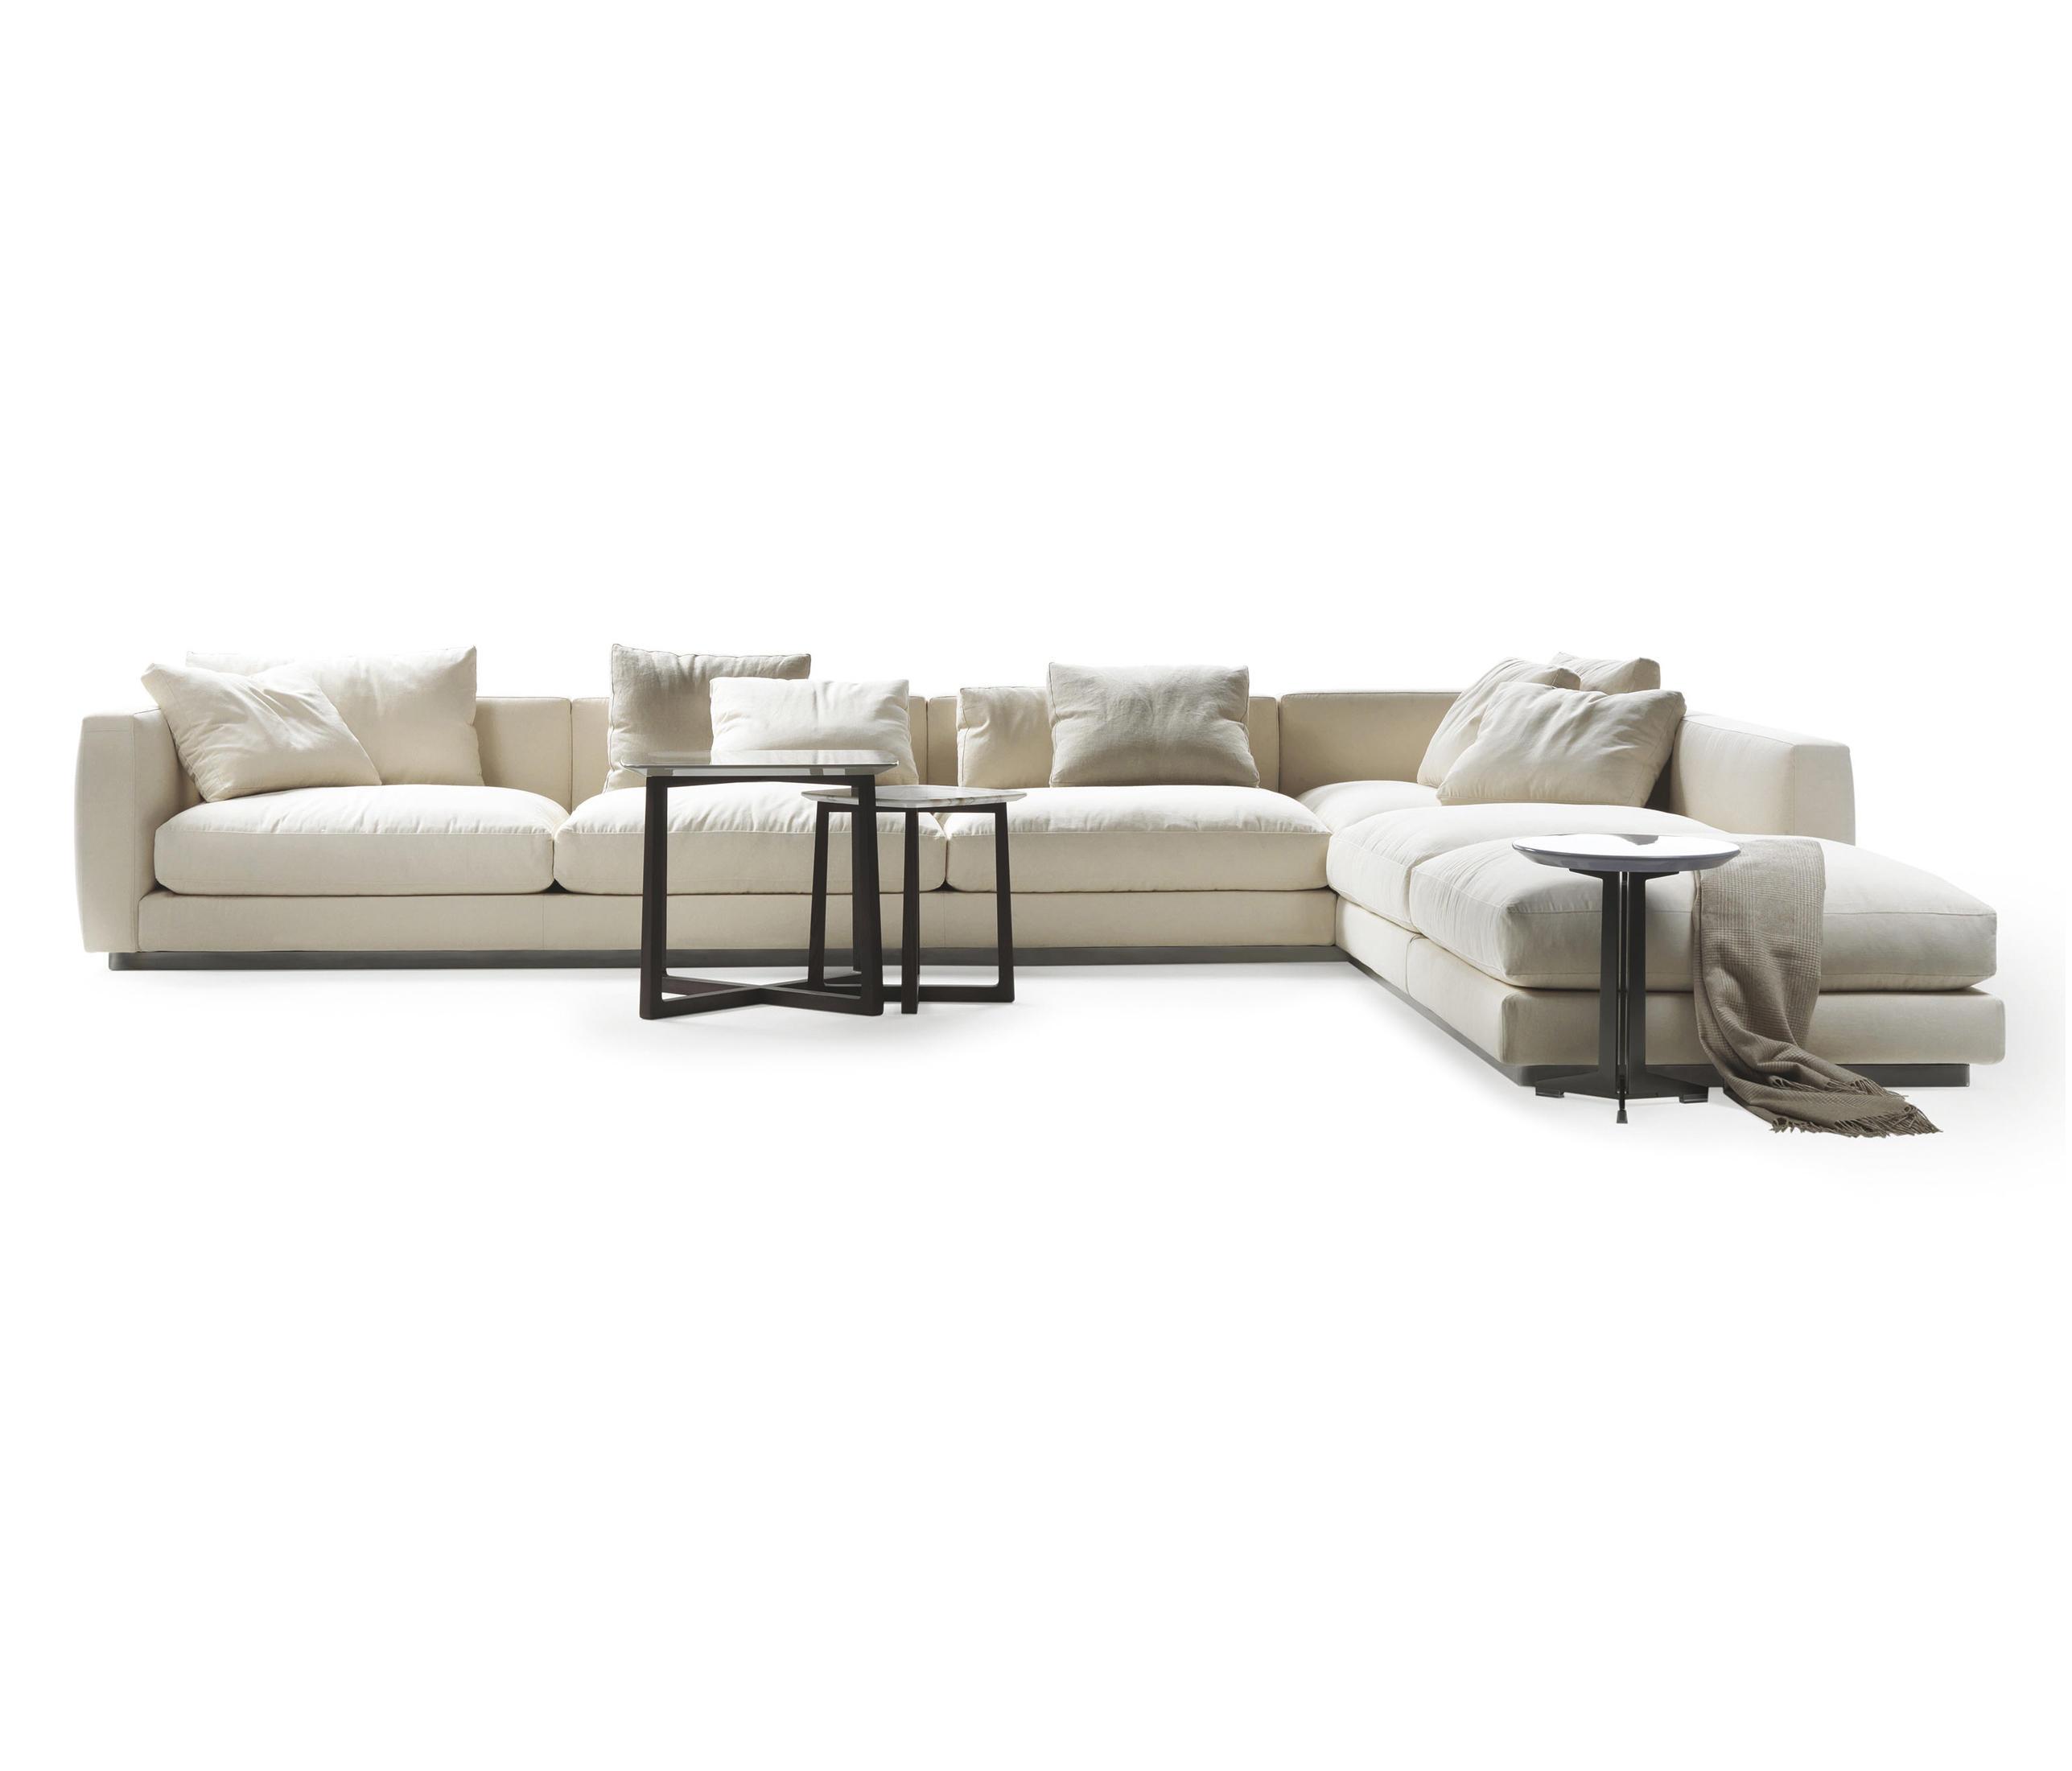 Pleasure Sectional Sofa By Flexform Sofas